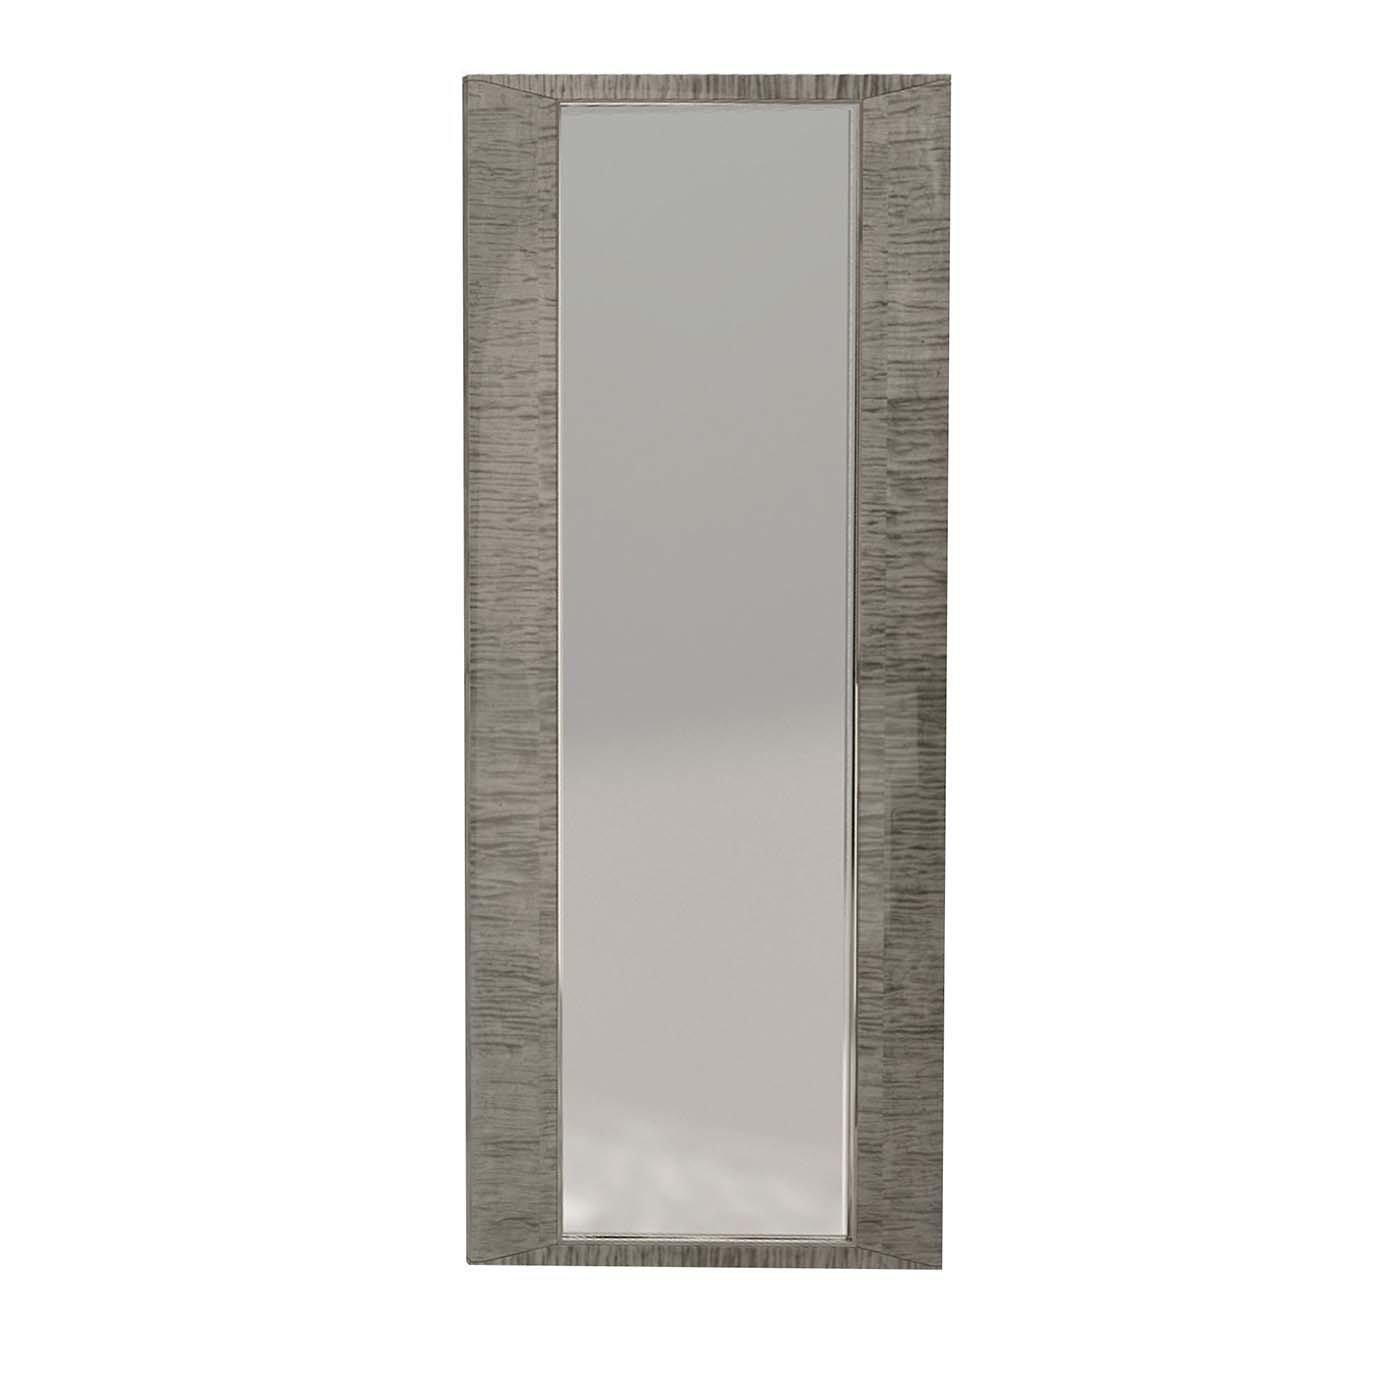 Smeraldo Wall Mirror FB Collection